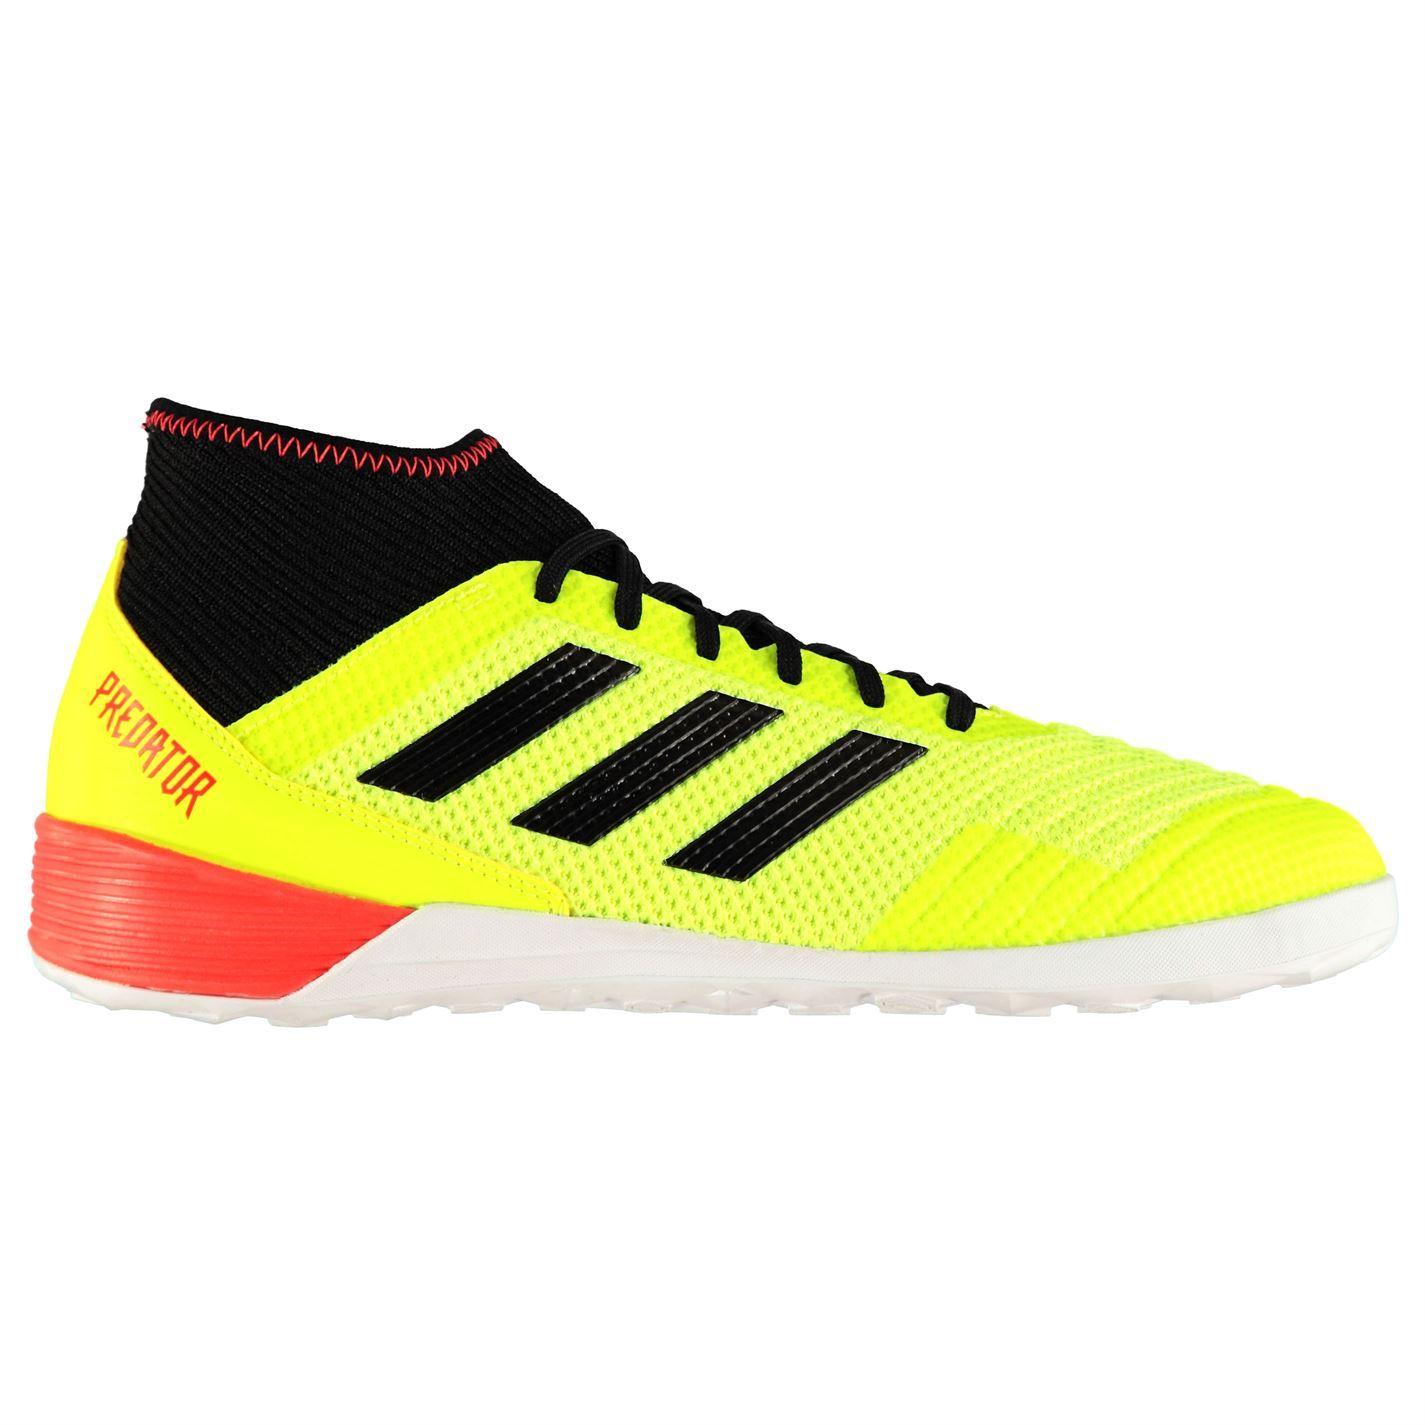 660f5f23837acb ... adidas Predator Tango 18.3 Indoor Football Trainers Mens Yellow Soccer  Shoes ...